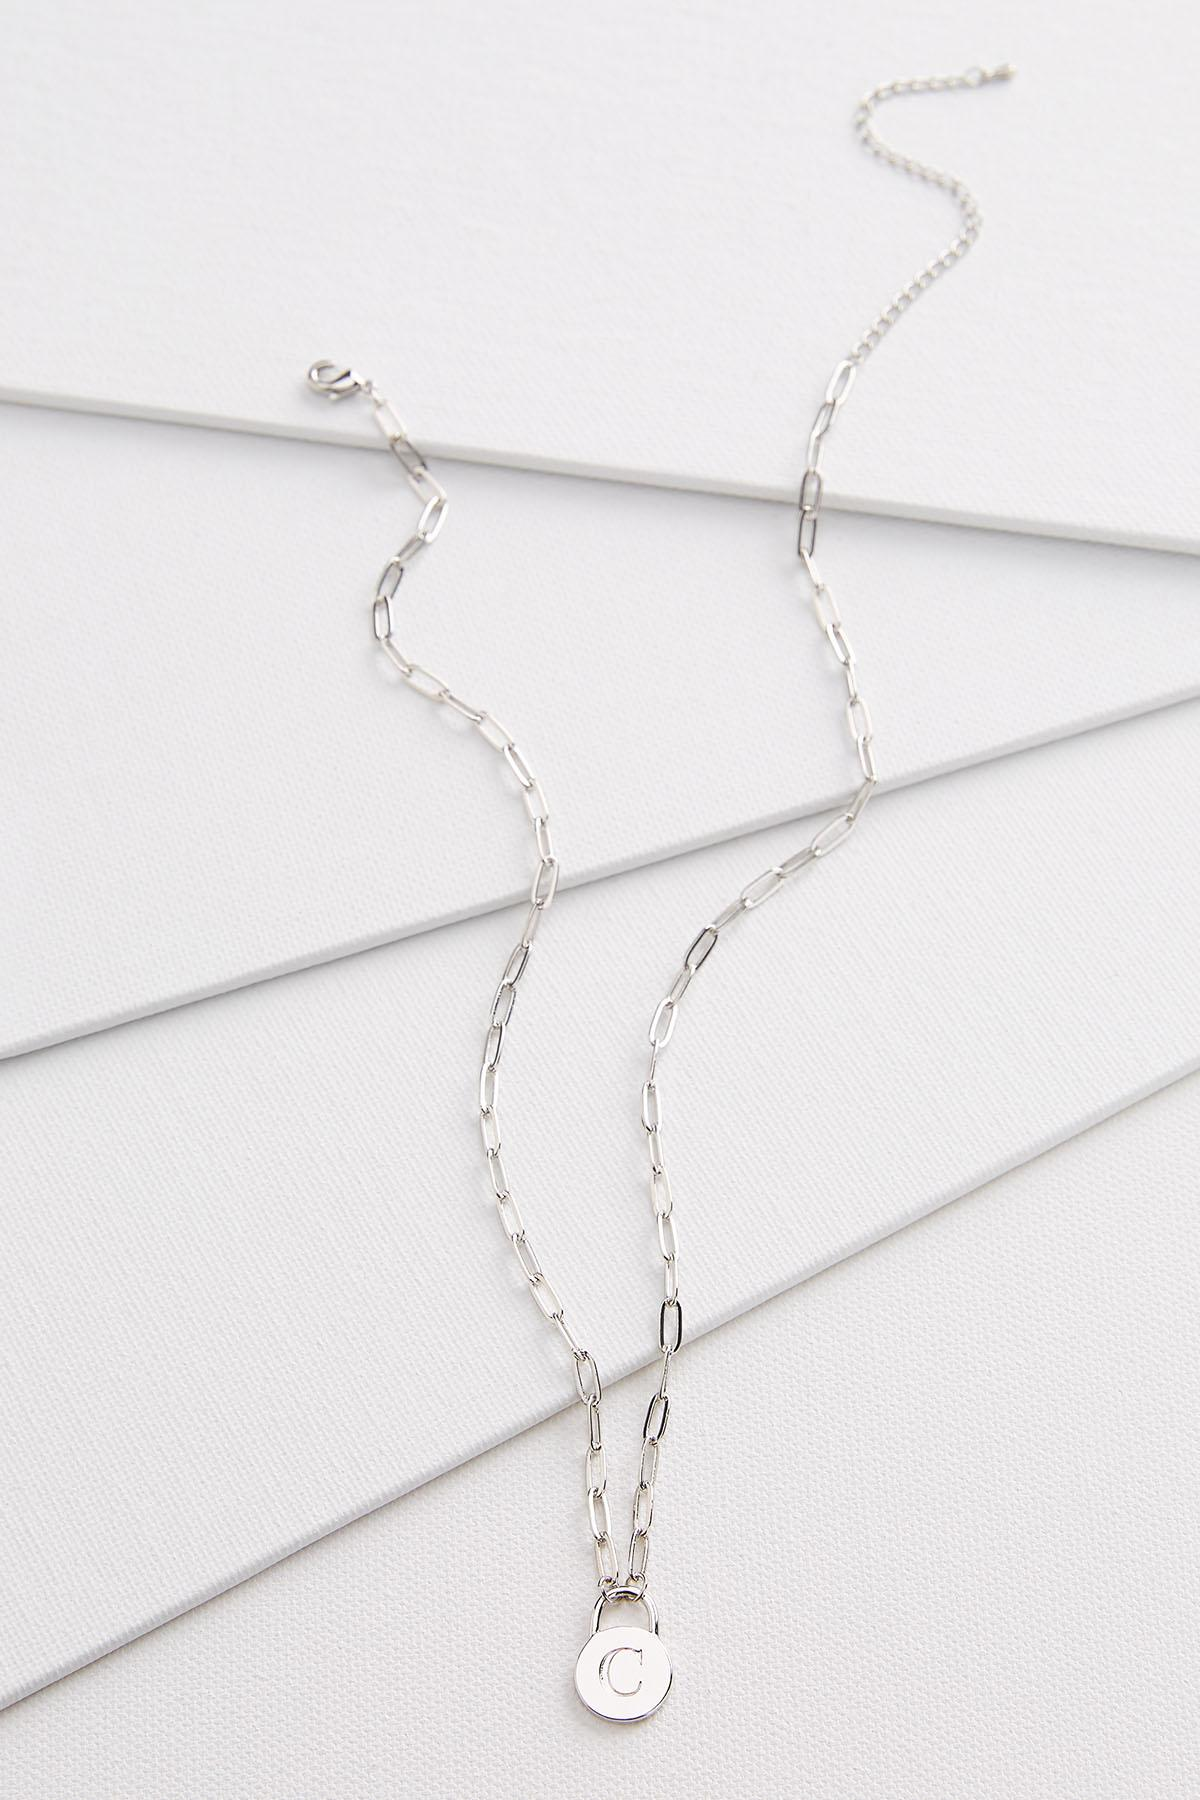 Silver C Necklace